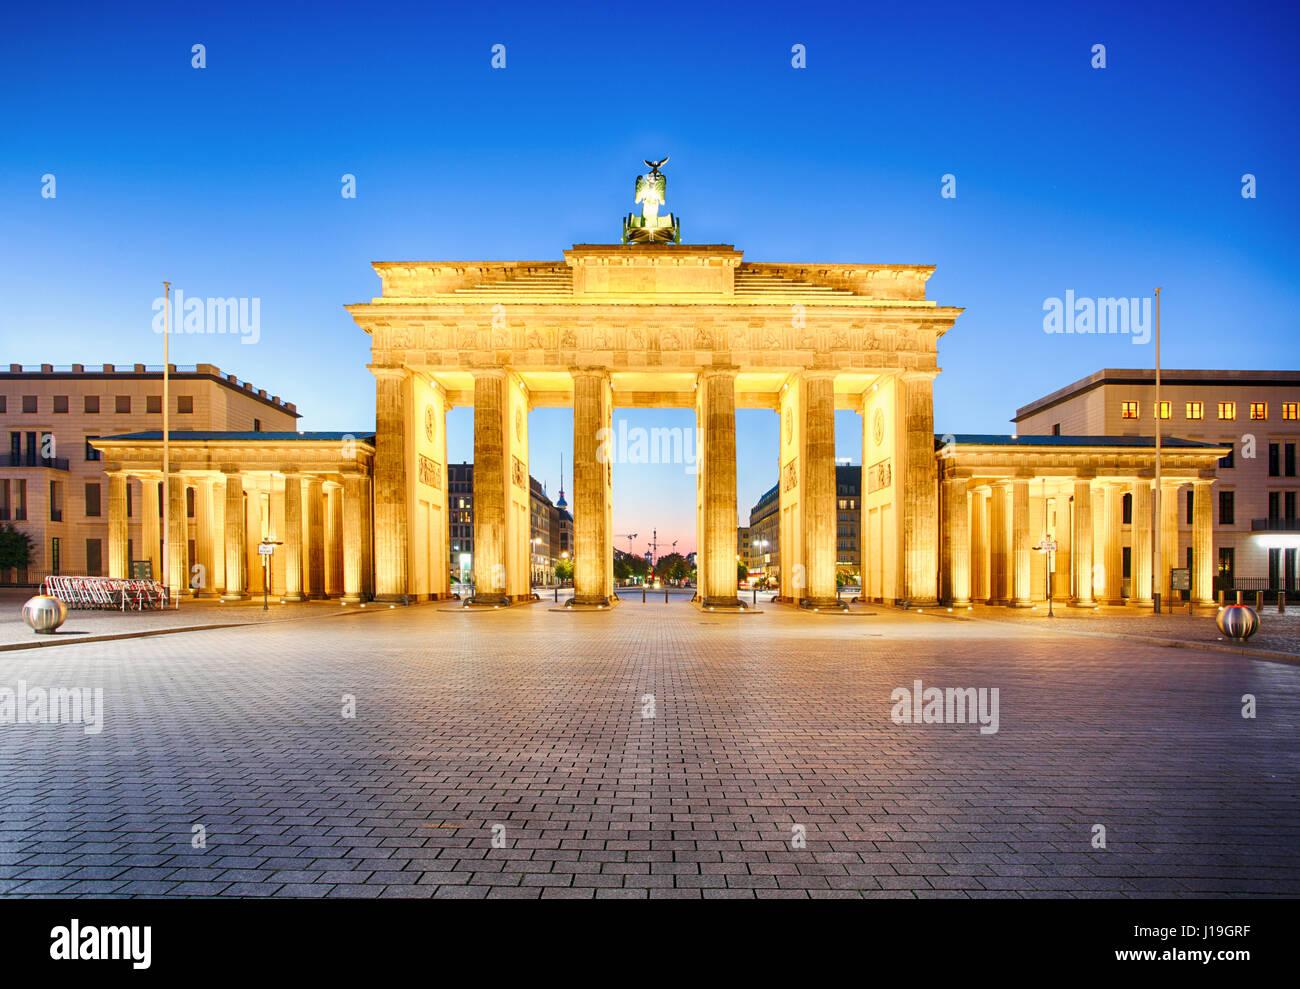 Puerta de Brandenburgo de Berlín, Alemán Imagen De Stock